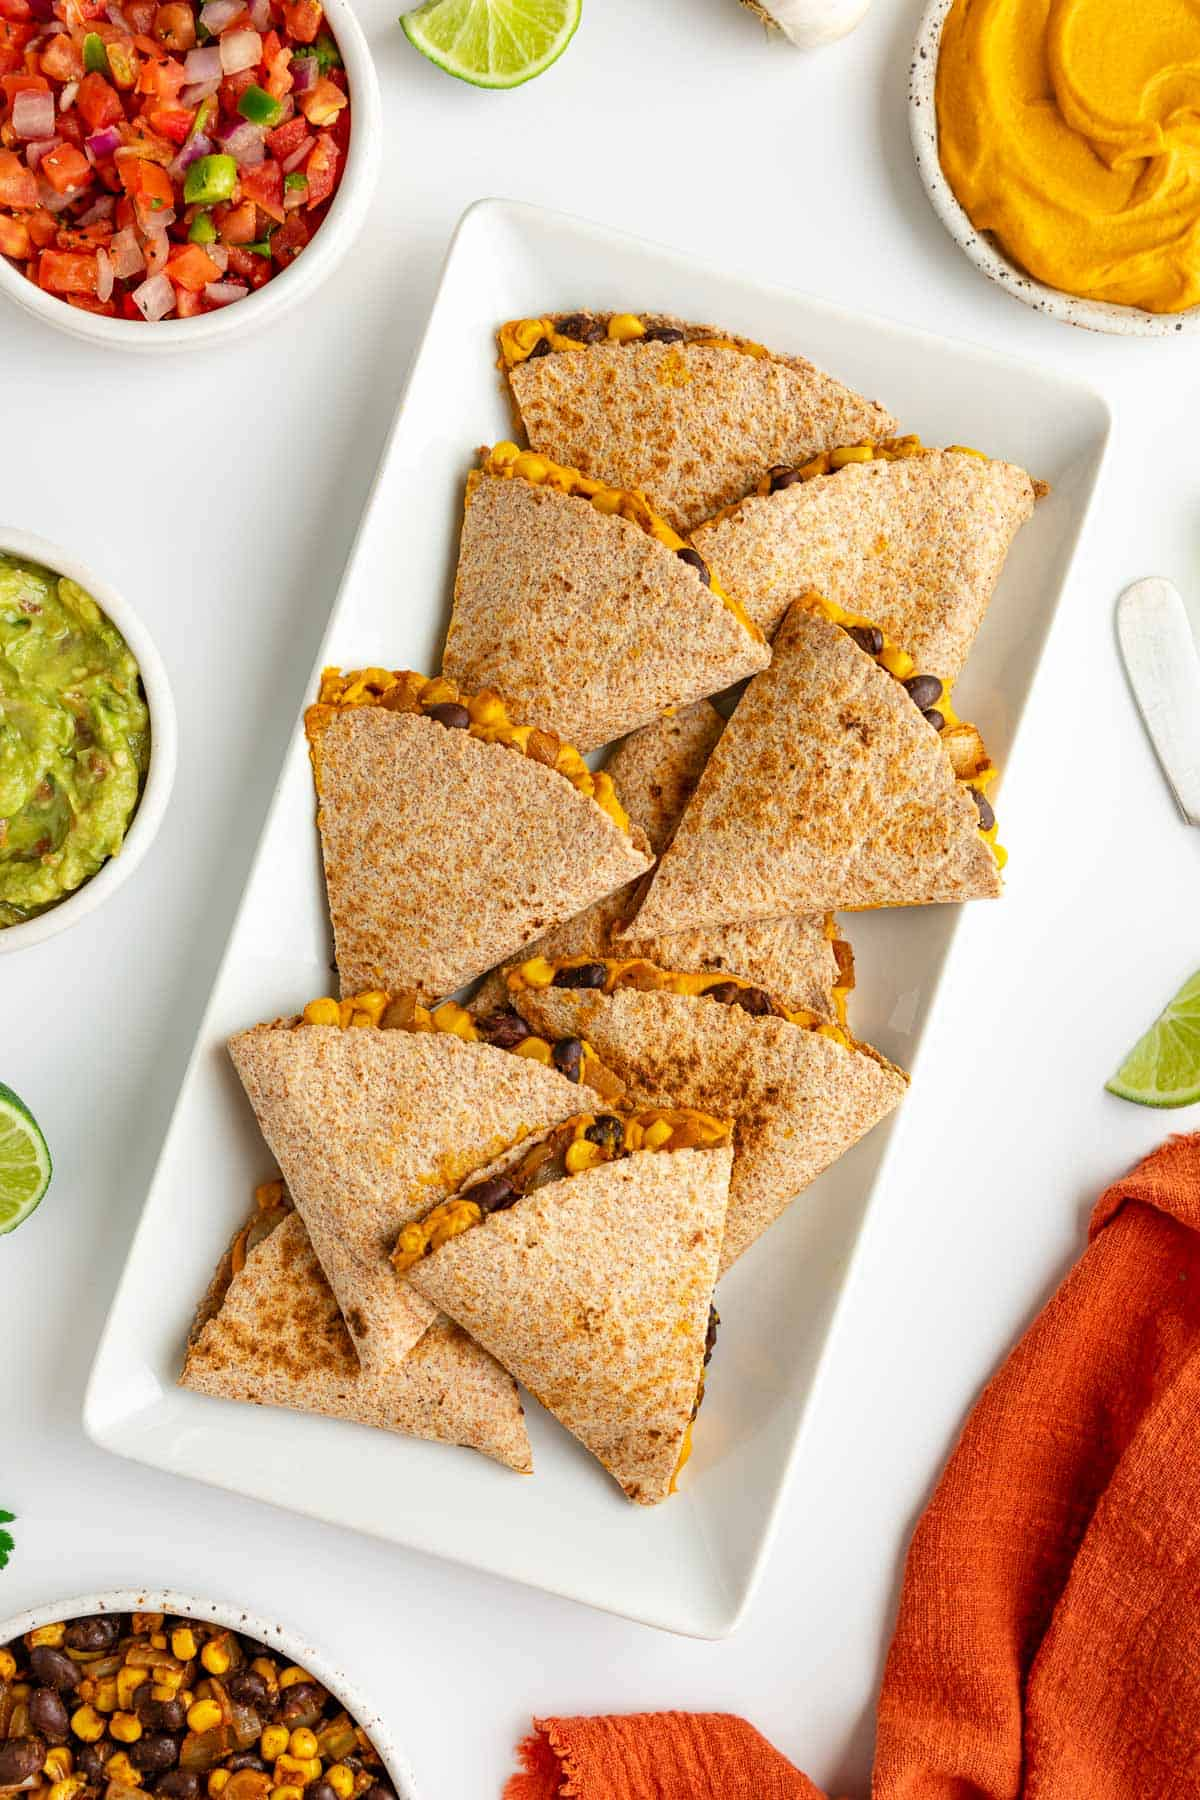 sweet potato black bean quesadillas on a white plate surrounded by bowls of guacamole, salsa, pico de gallo, and cilantro